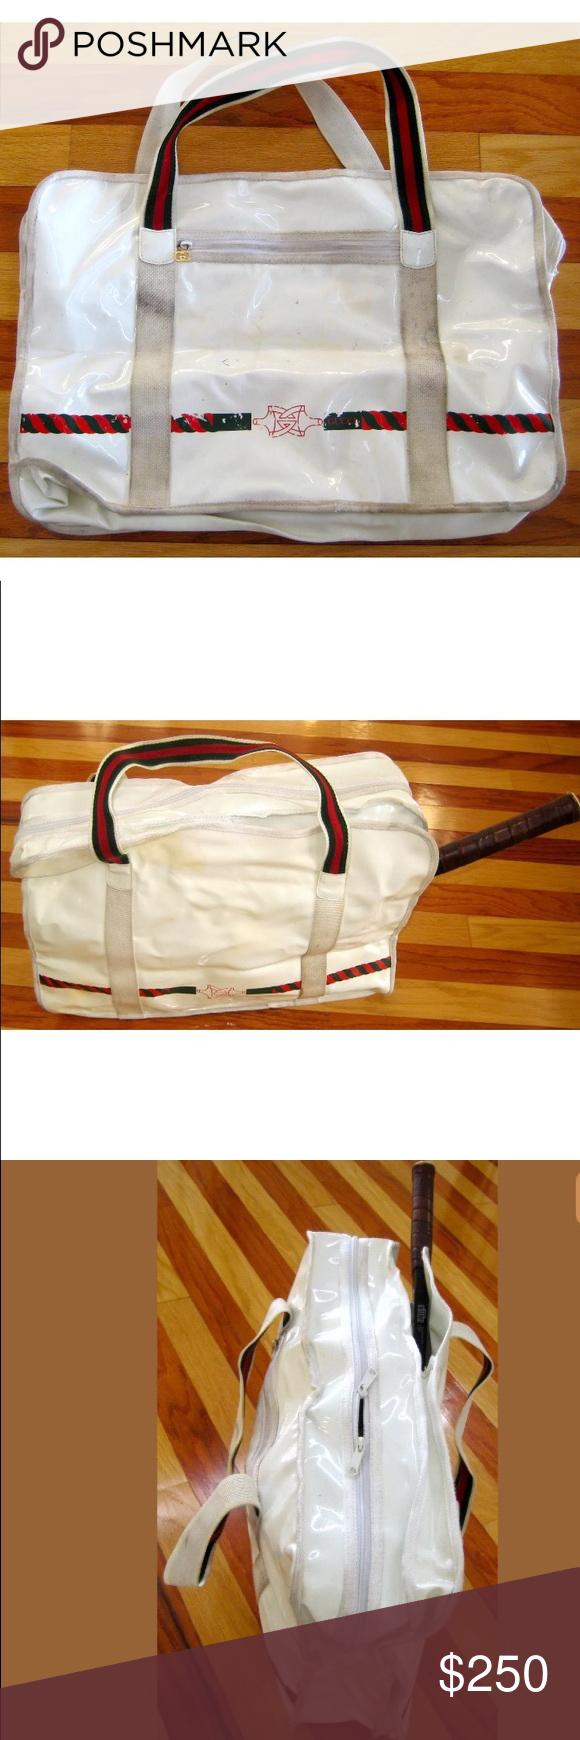 c85b9268e2d8 1970s GUCCI LARGE WHITE VINYL TENNIS BAG STRIPE Vintage Gucci from the 70s. Large  tennis